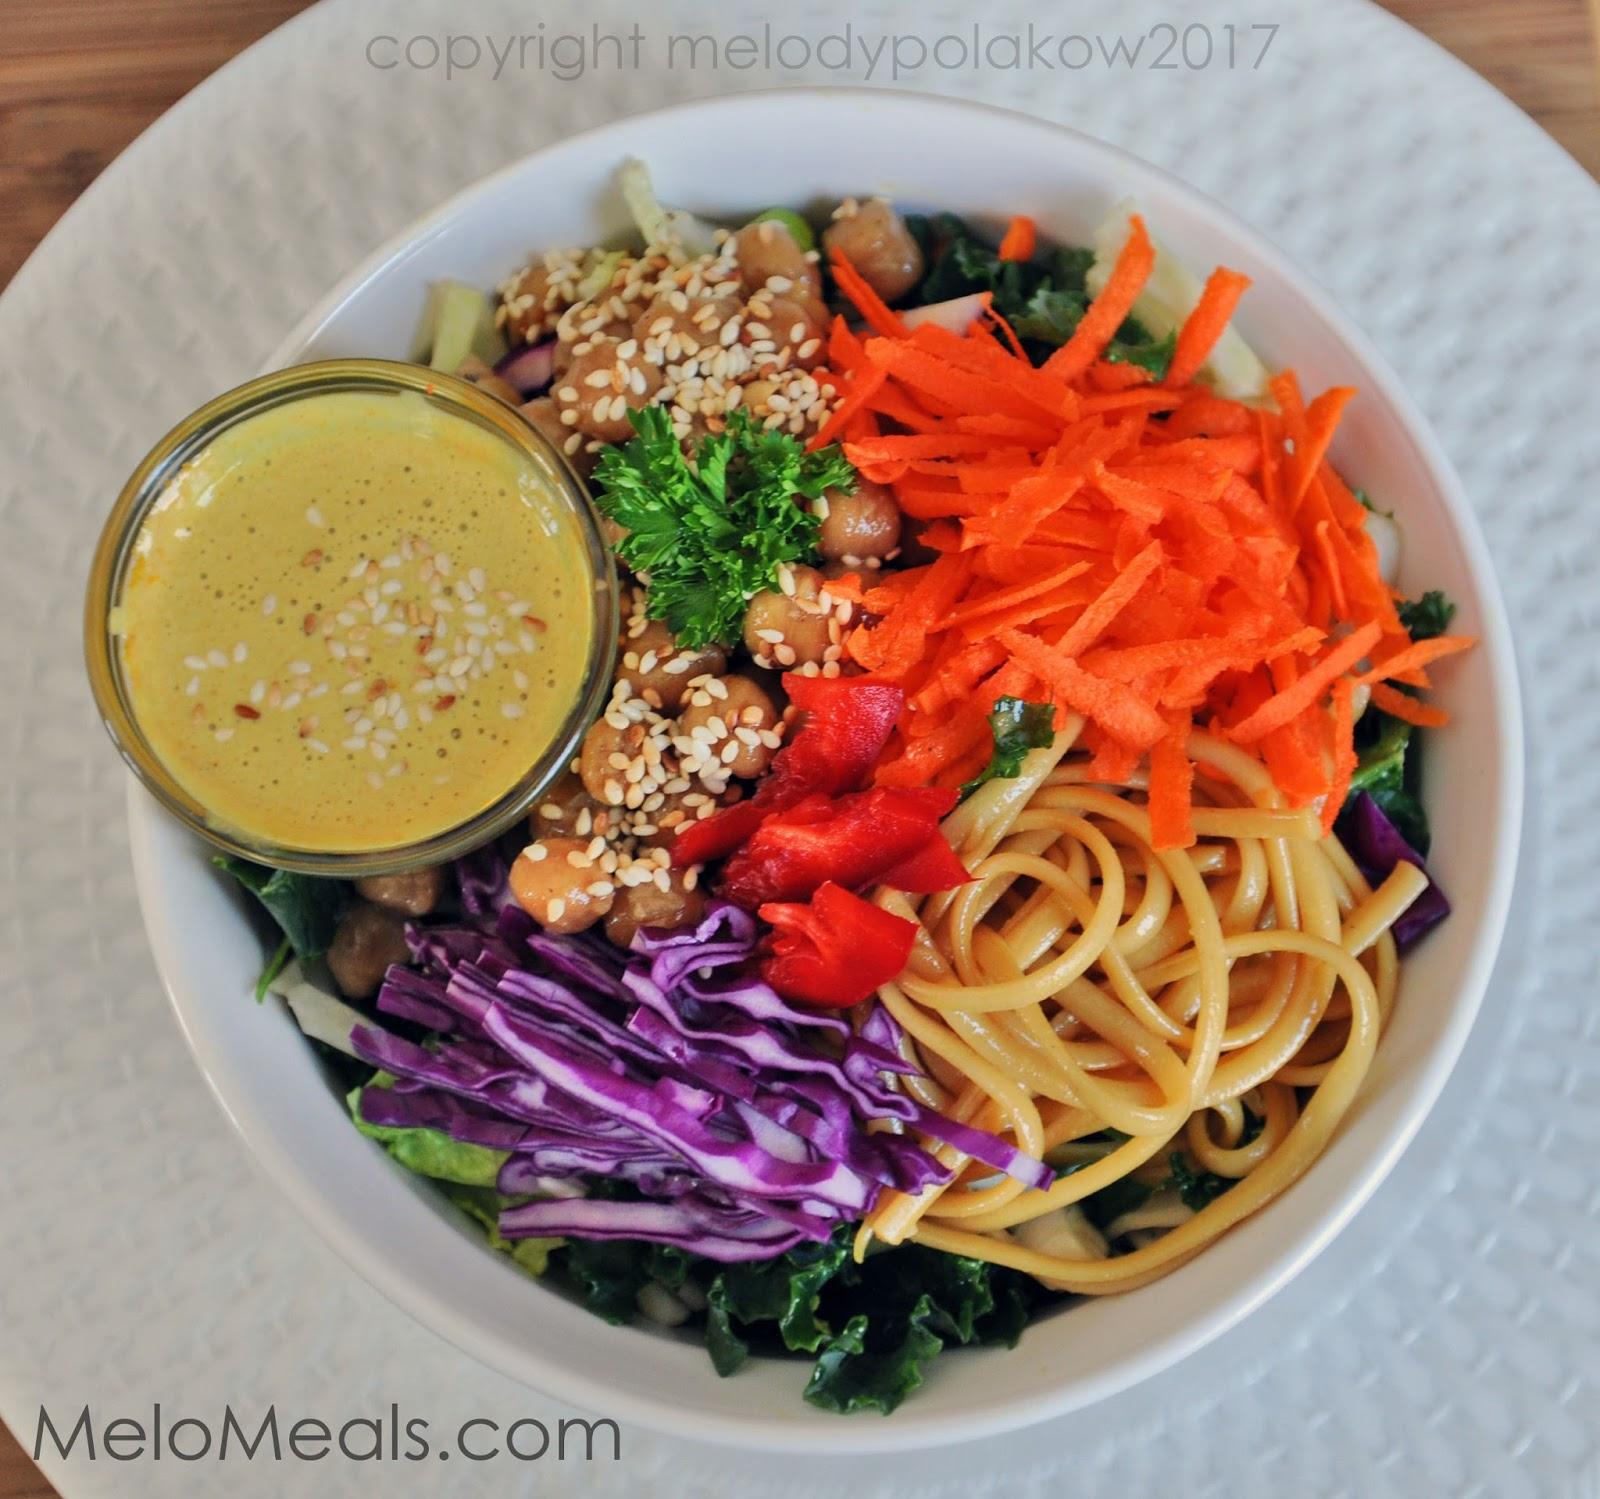 Spiced Chickpeas, Kale, Cabbage, Carrots, Rice Noodles, Sesame-Ginger ...